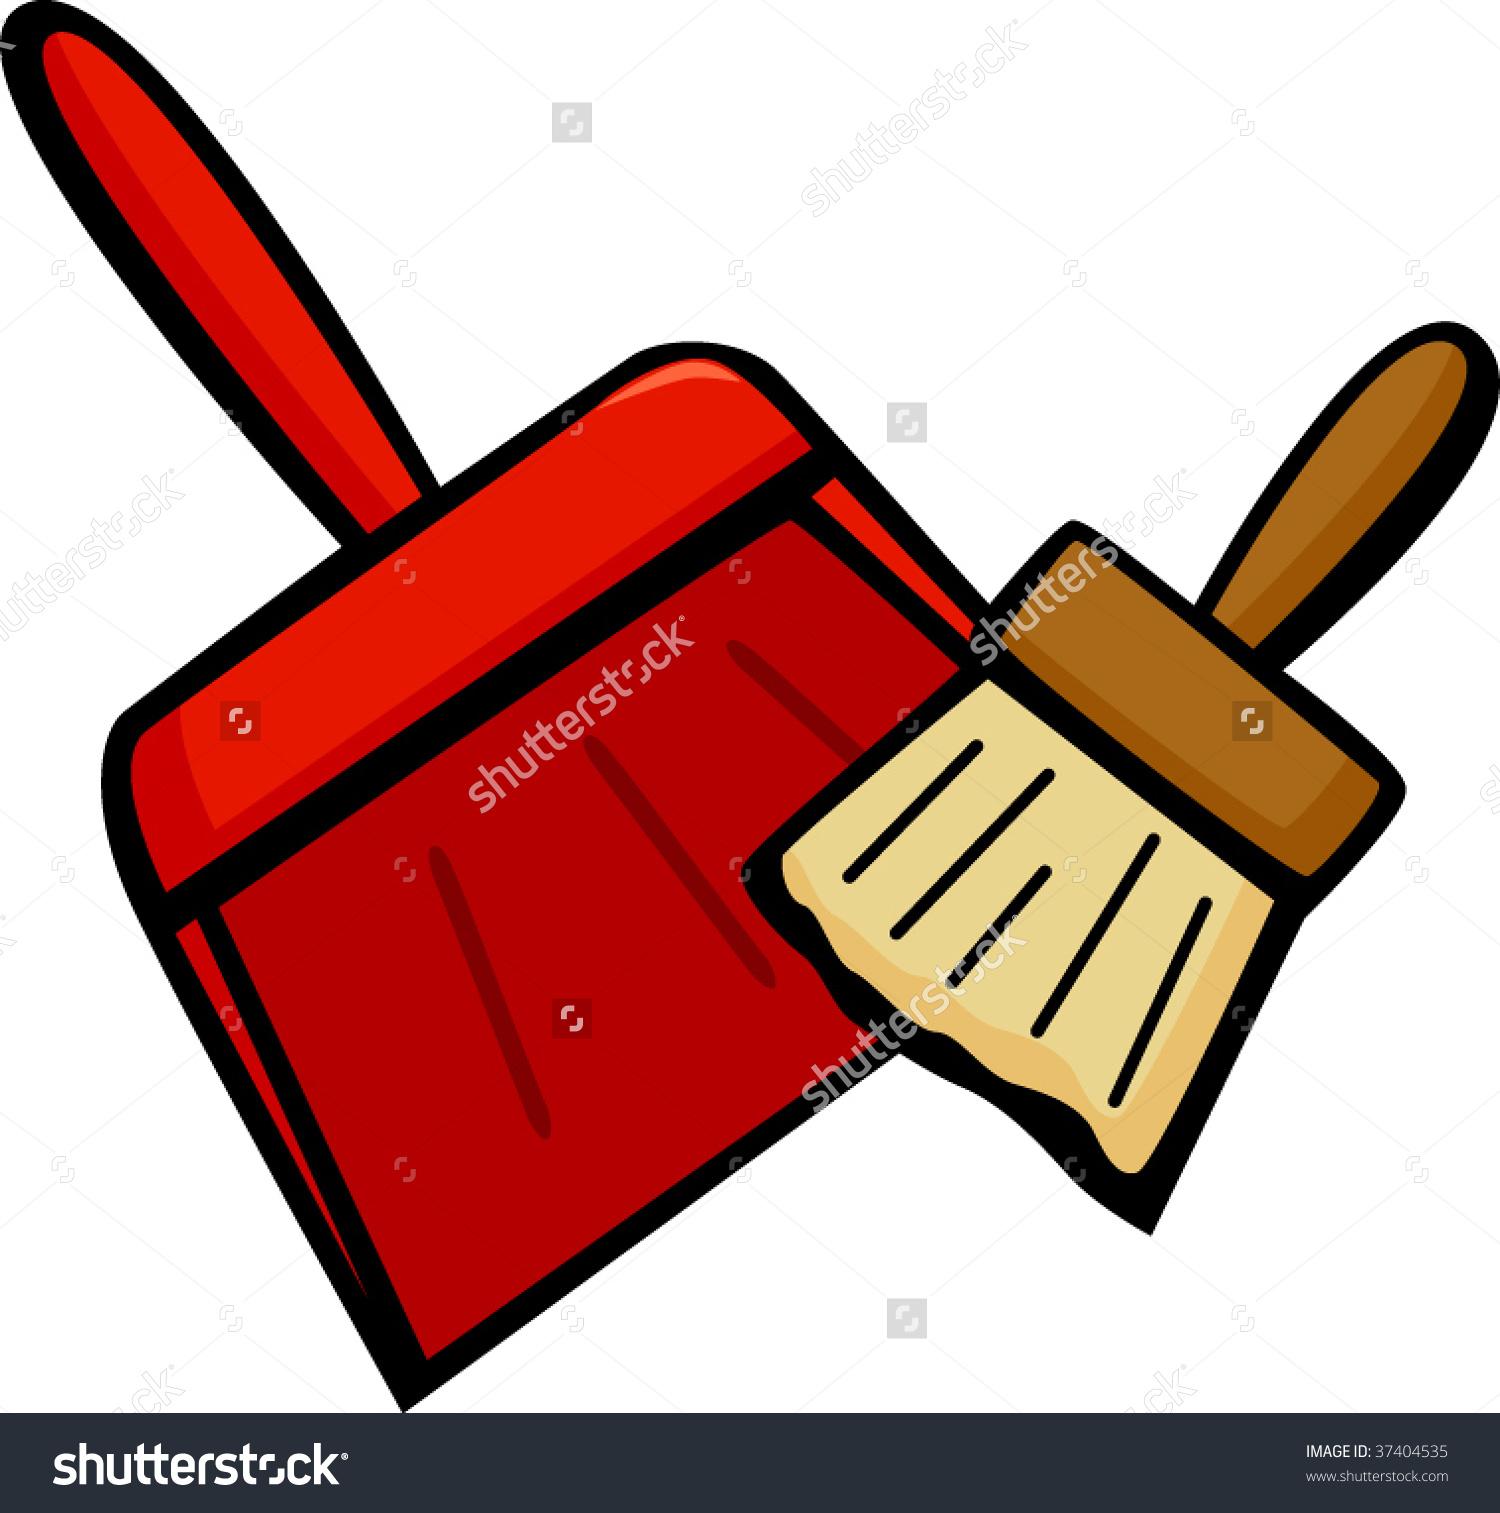 Comfortable dust hdx lobby. Brush clipart pan